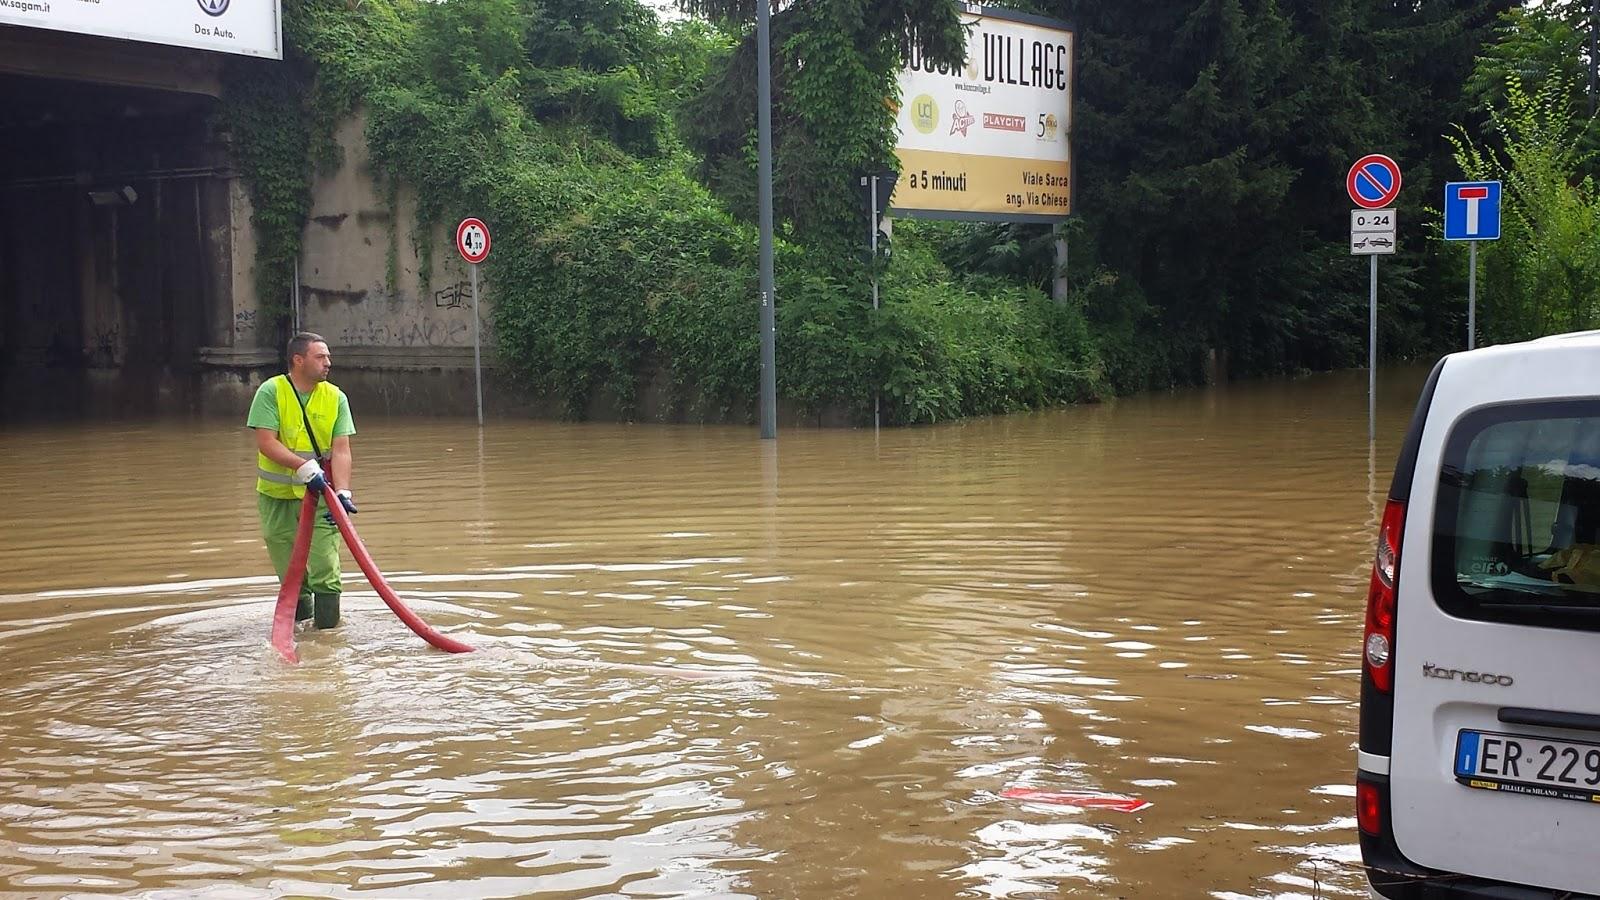 Samuele piscina comunicato stampa piscina assessore - Piscina di senago ...